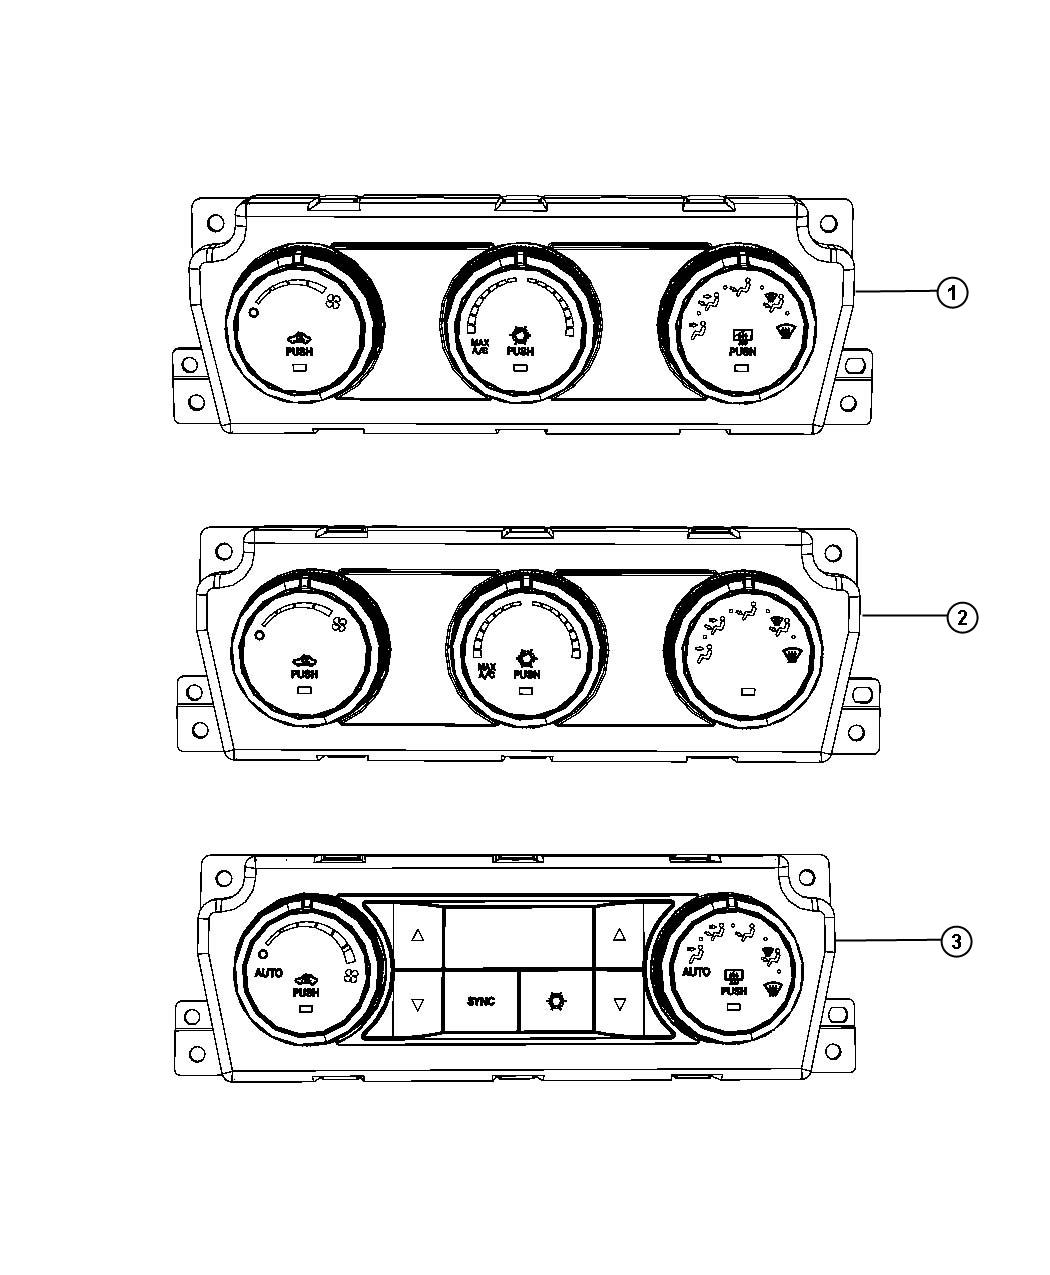 Dodge Ram Control A C And Heater Air Cond Atc